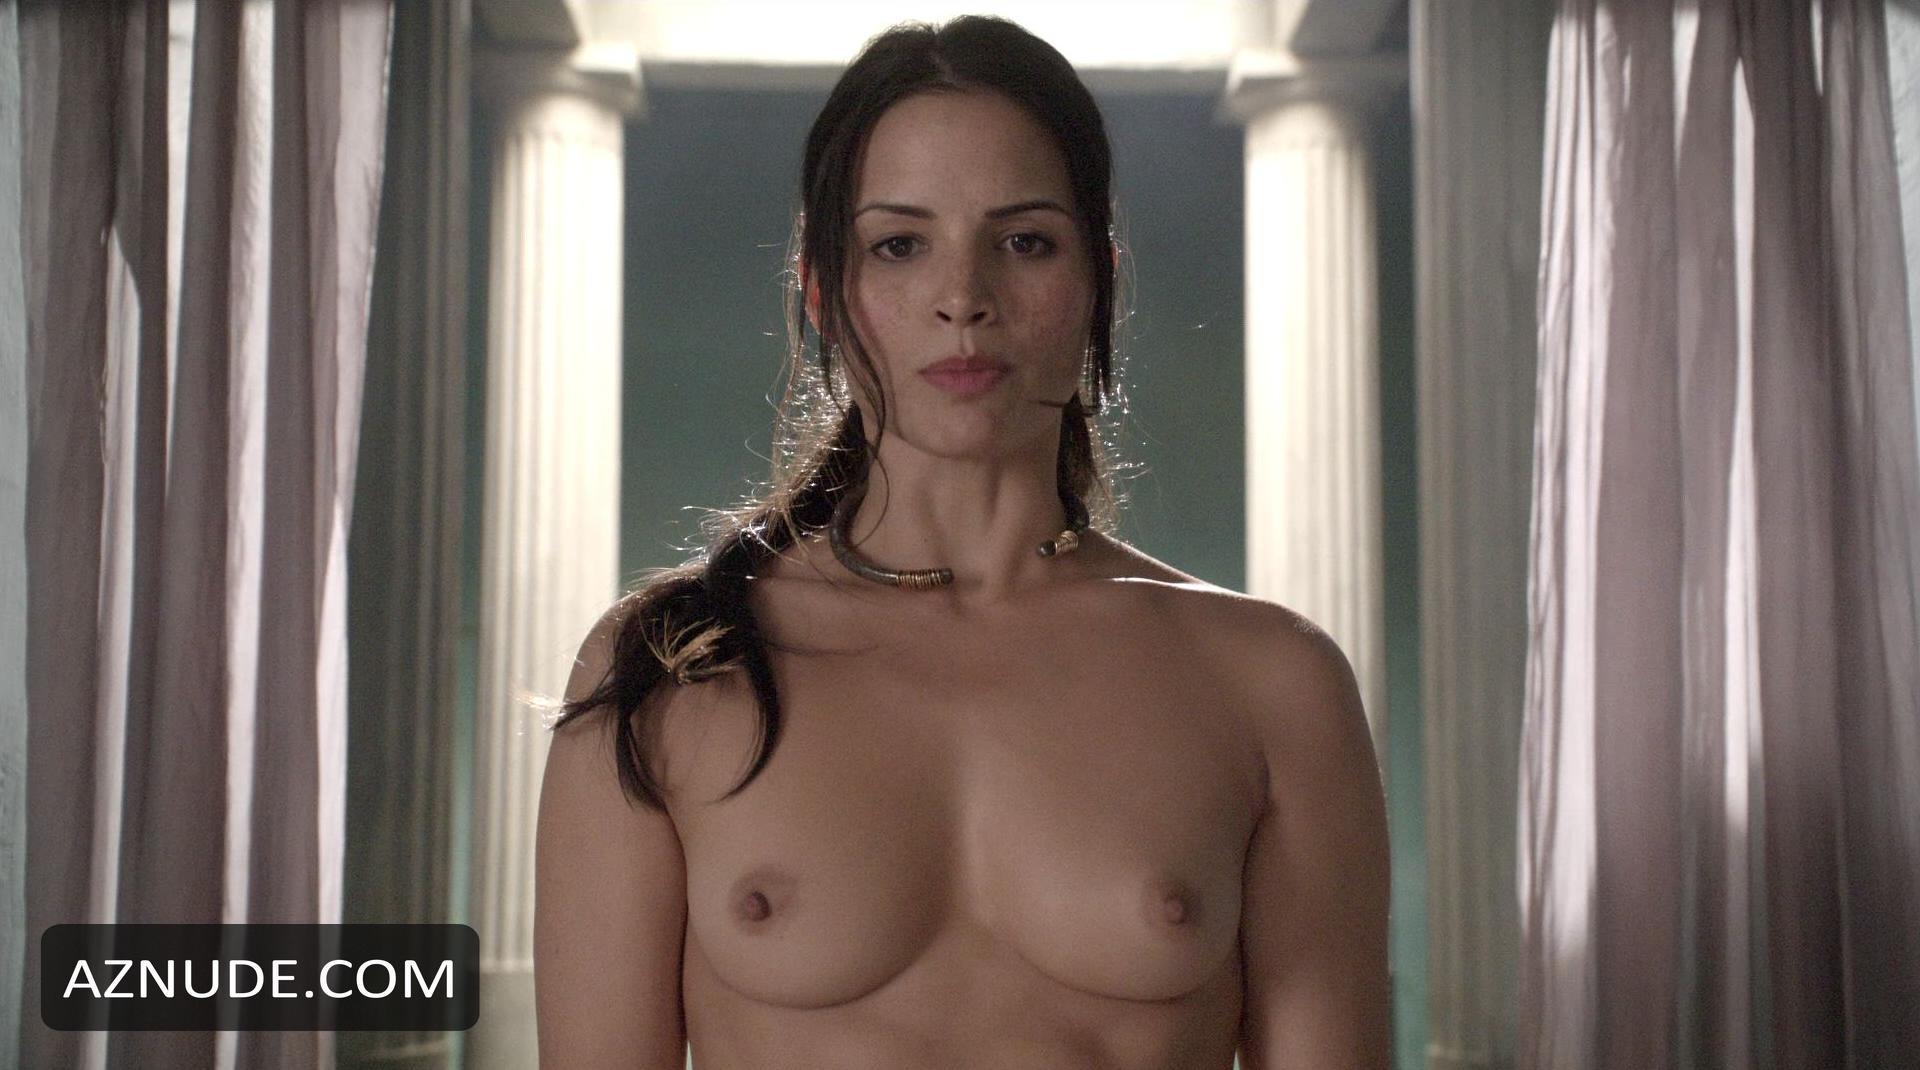 Rosie jones and india reynolds nude